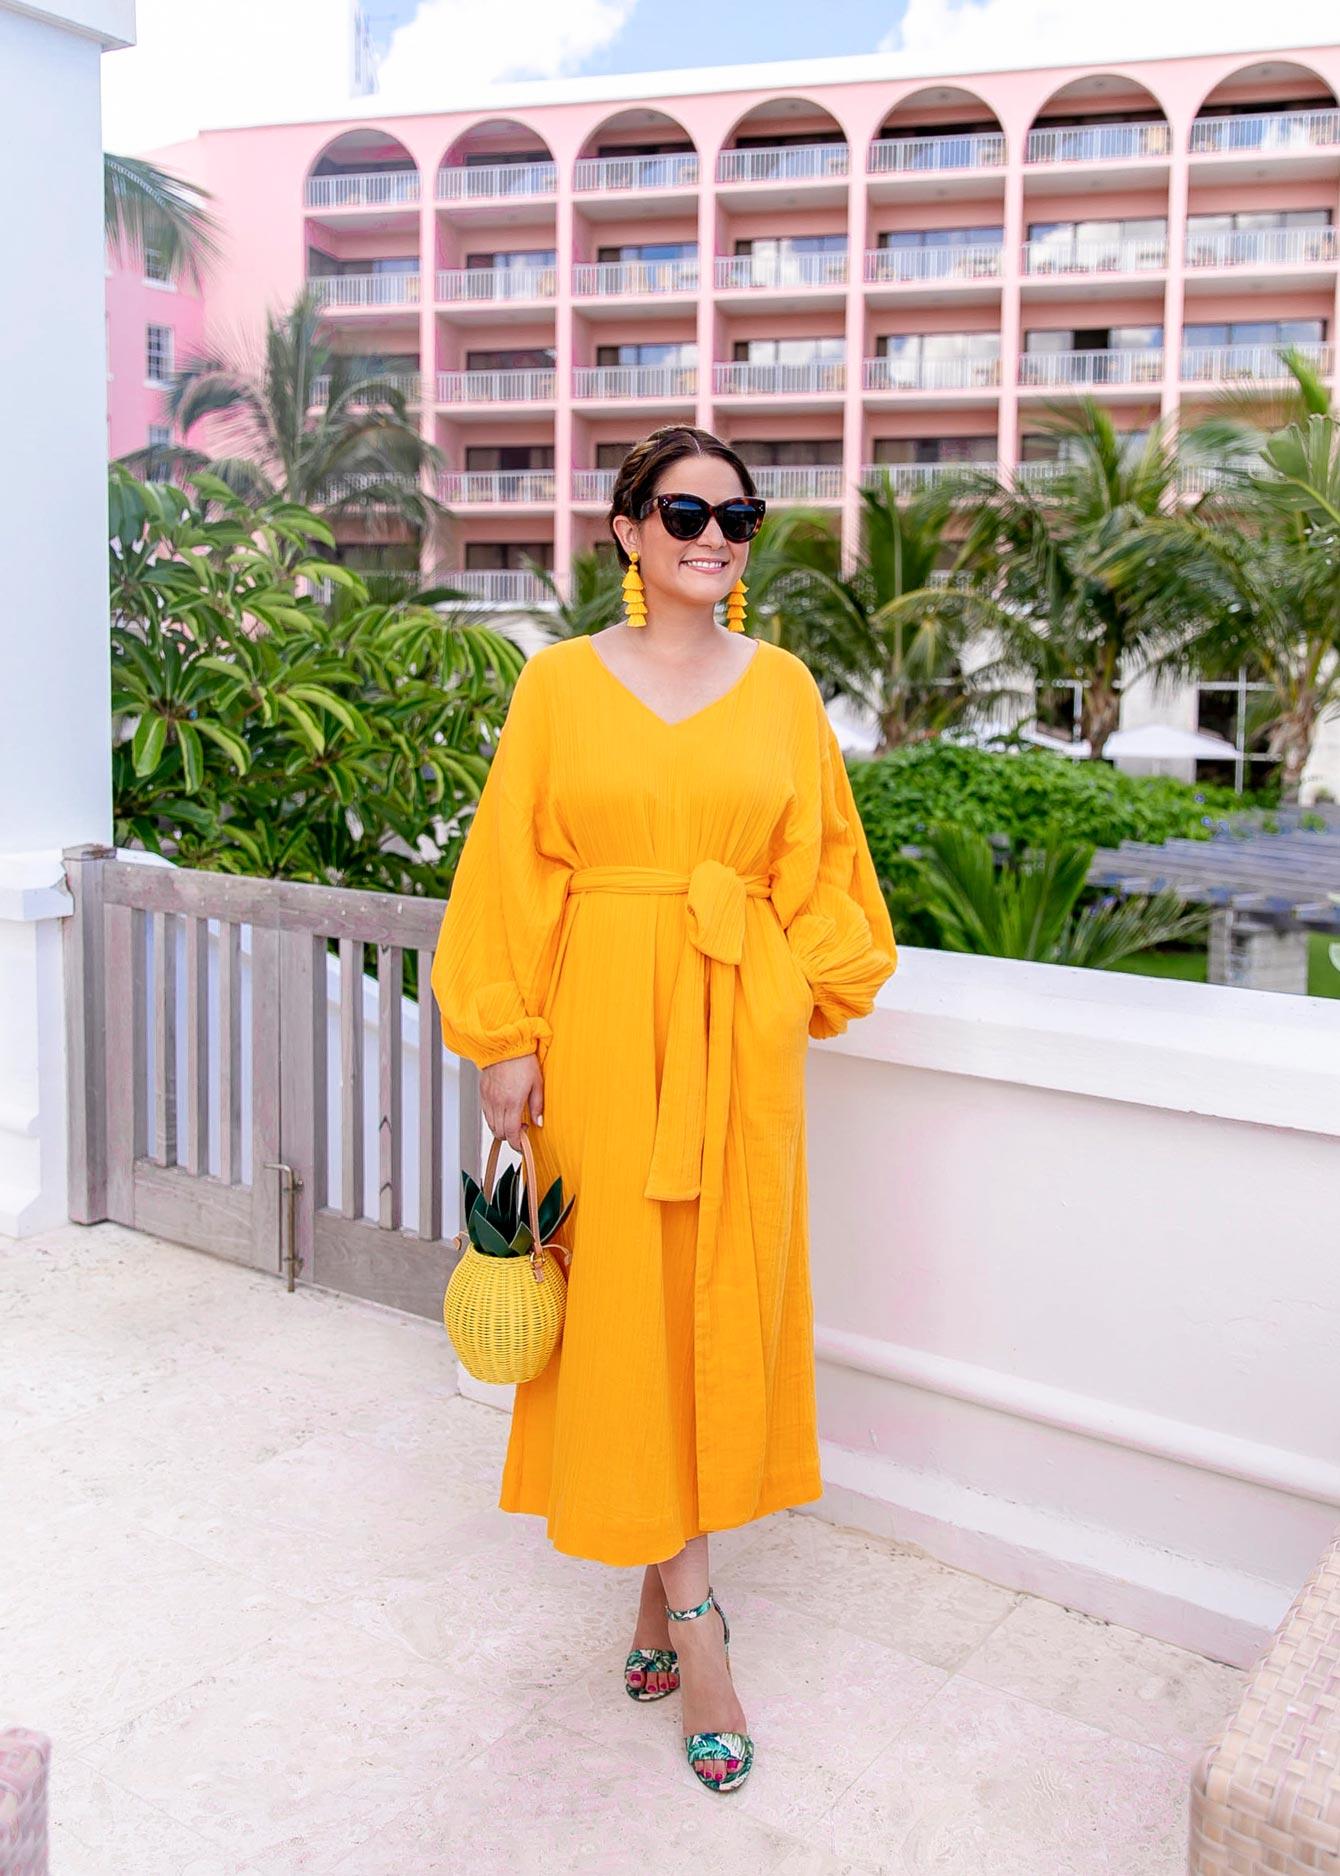 Style Charade Bermuda Princess Hotel